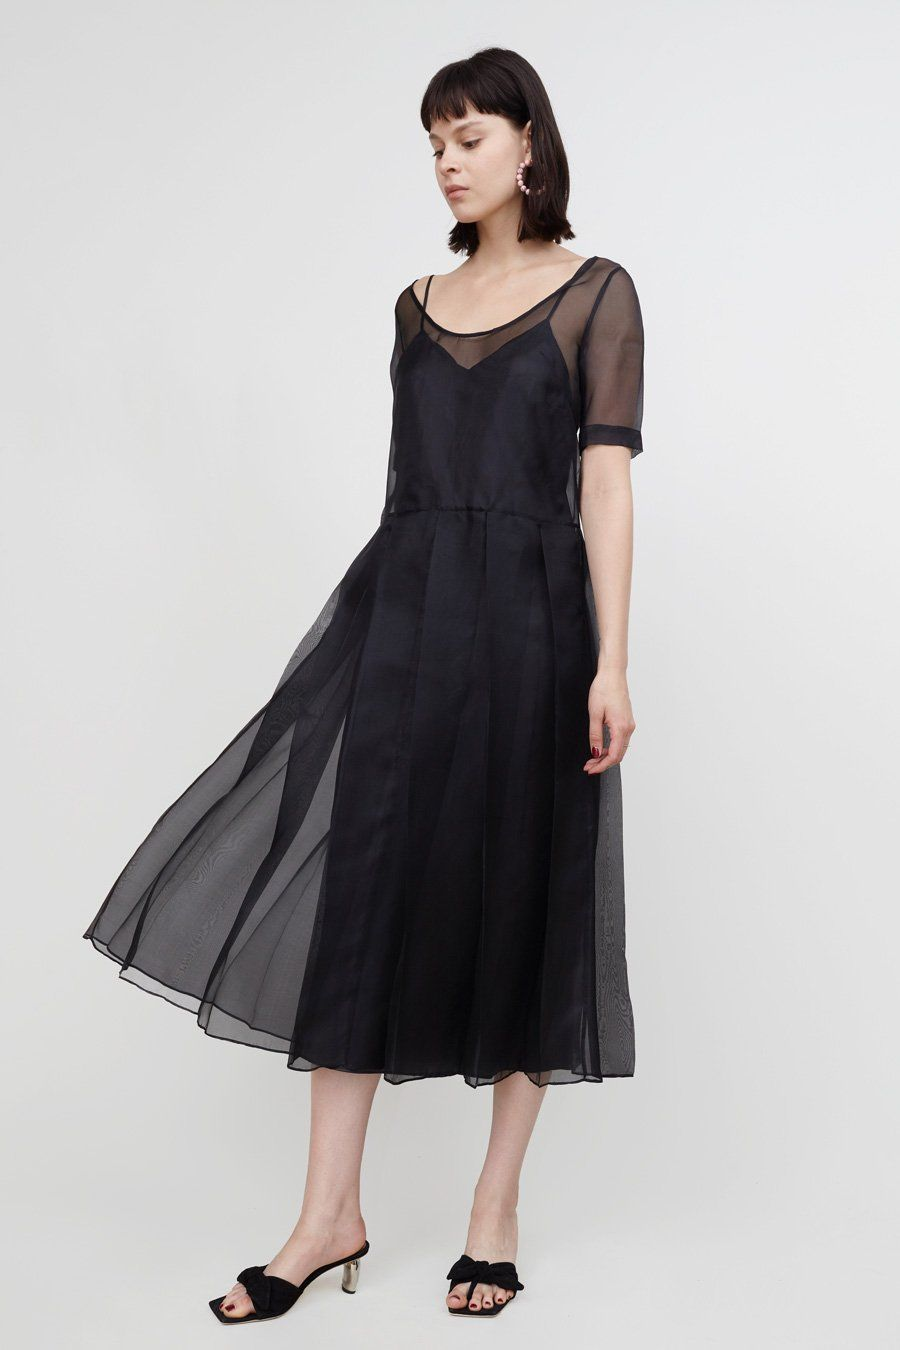 607f524932b4 Suzanne Rae Organza Dress with Slip in Black